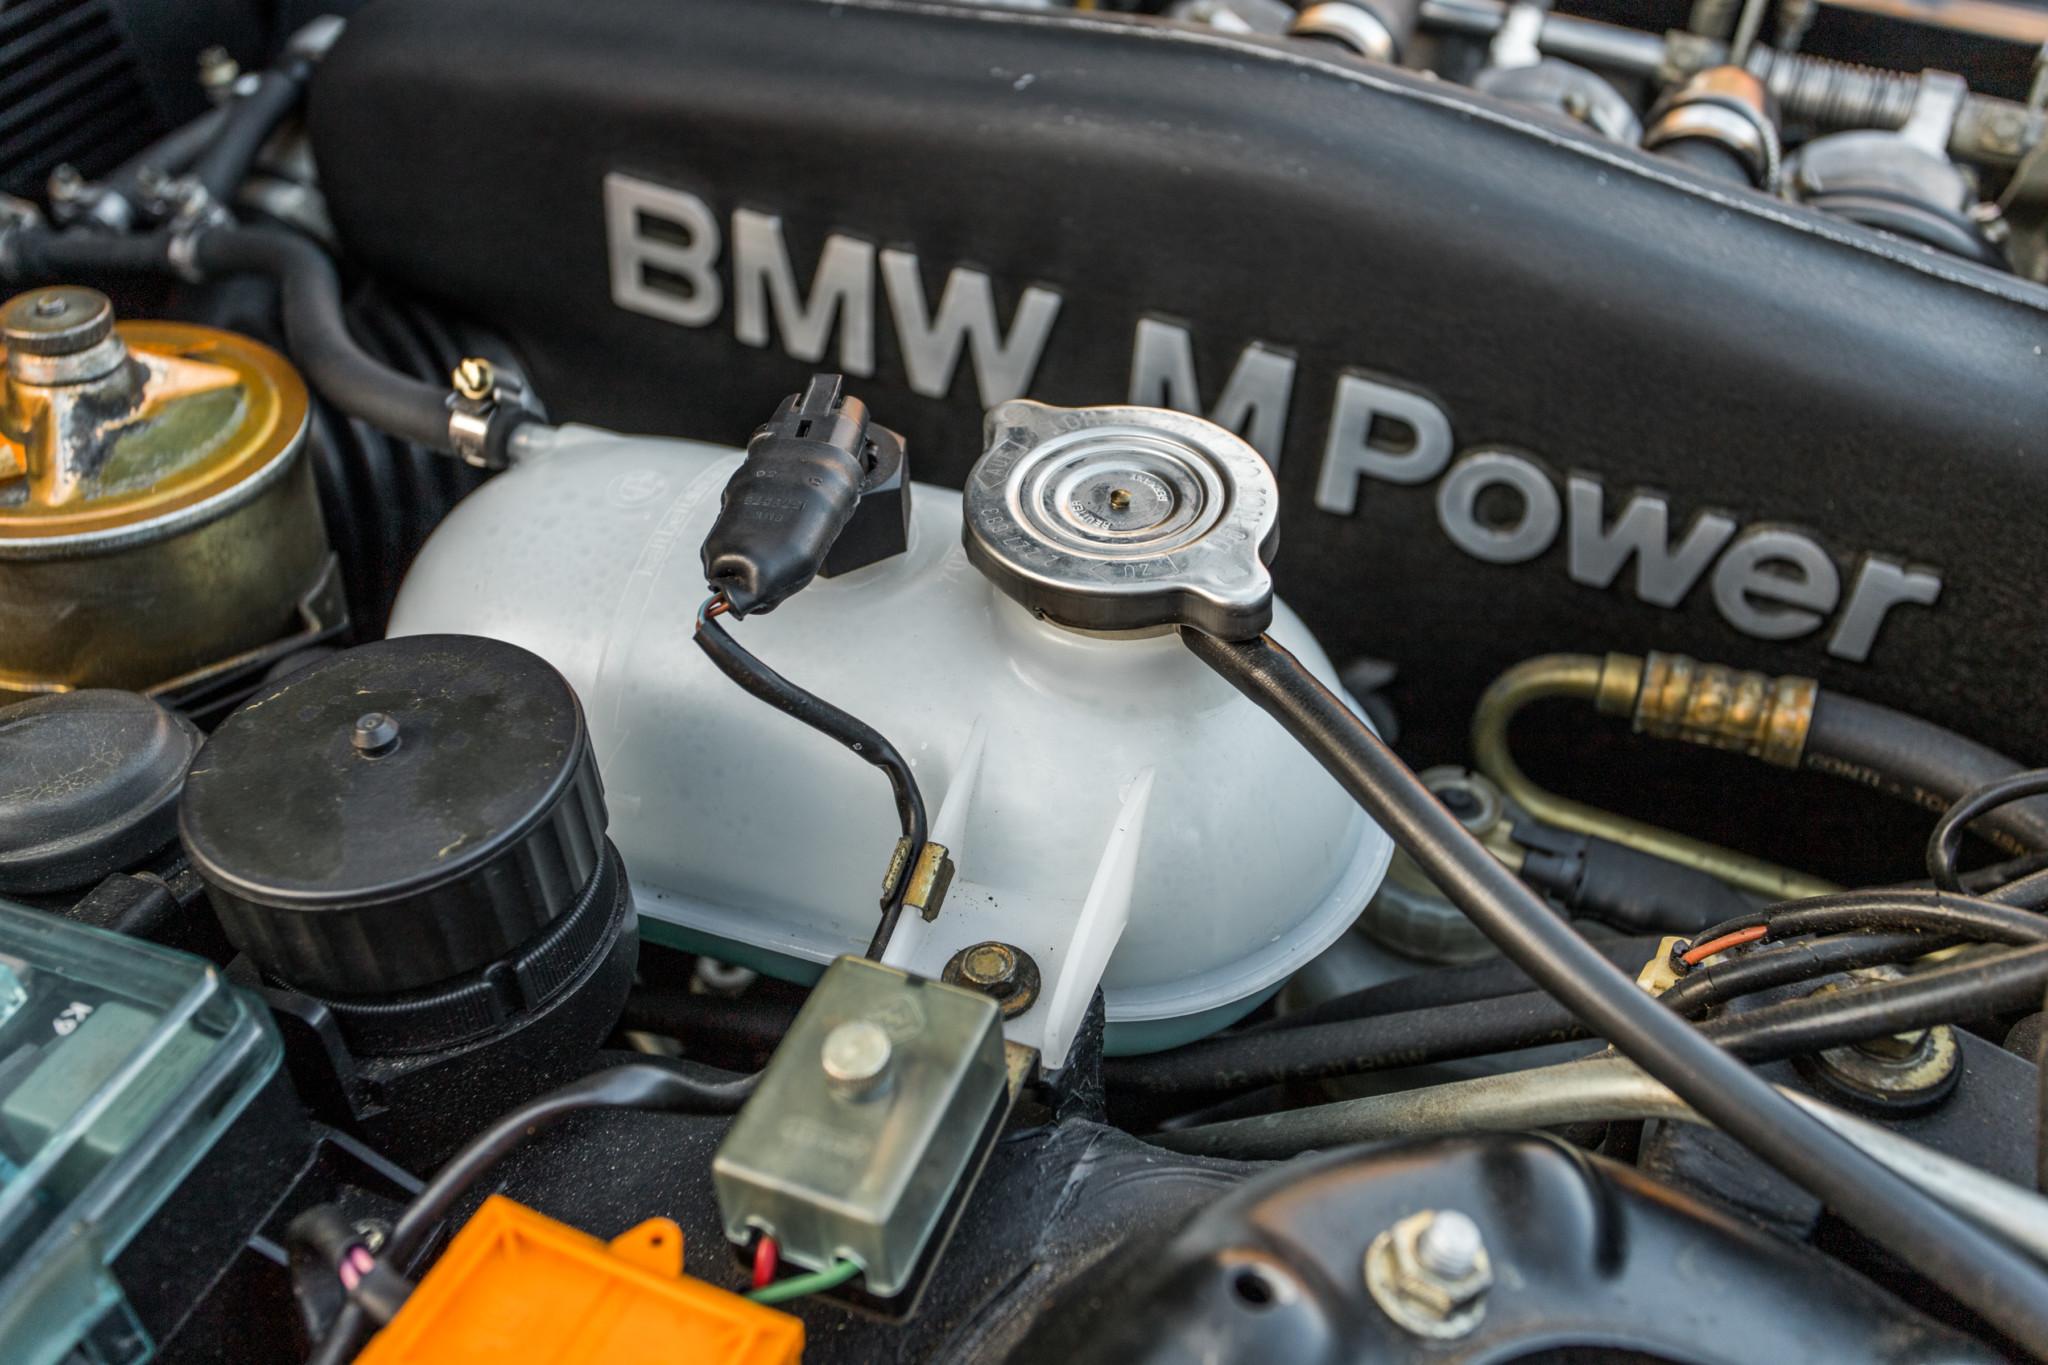 1988 bmw M6 kent classic cars (84).jpg